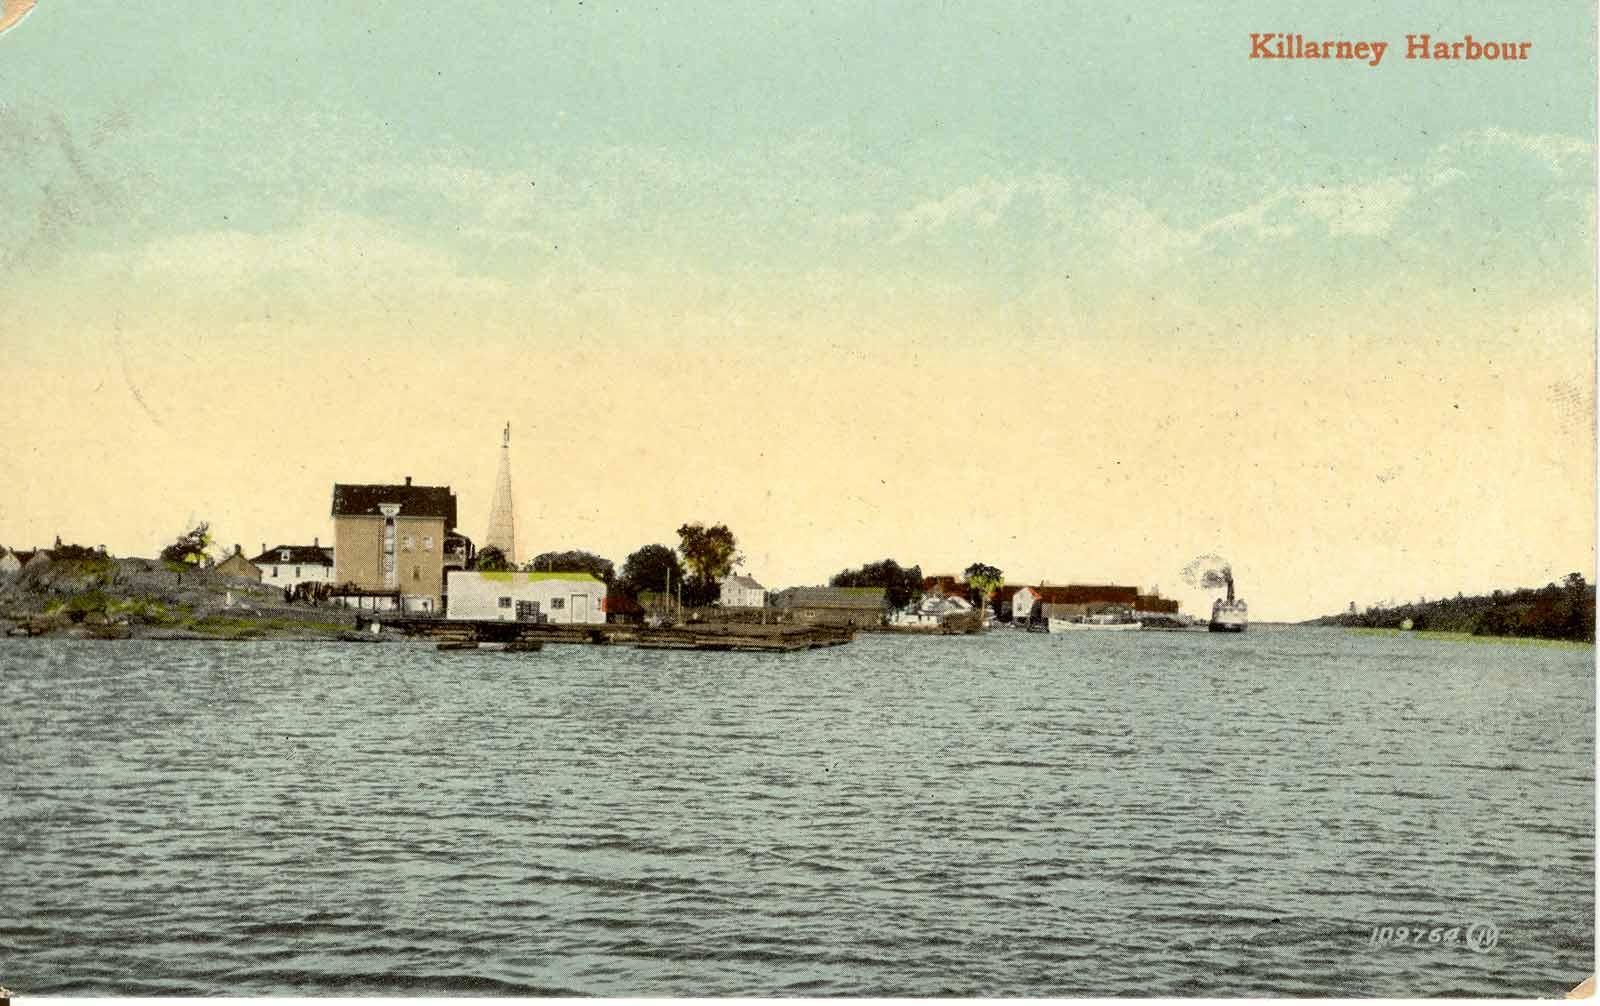 Killarney Harbour